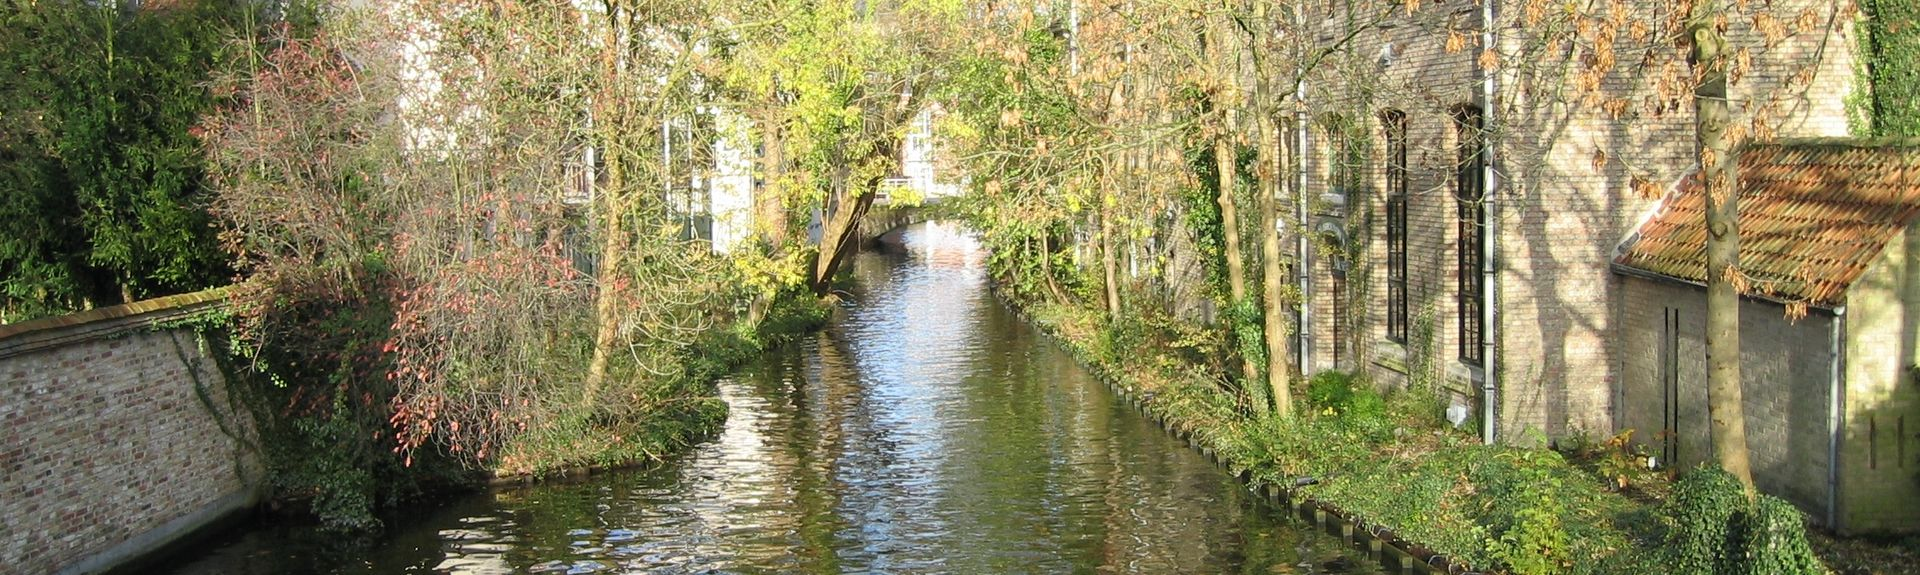 Länsi-Flanderi, Flanderin alue, Belgia